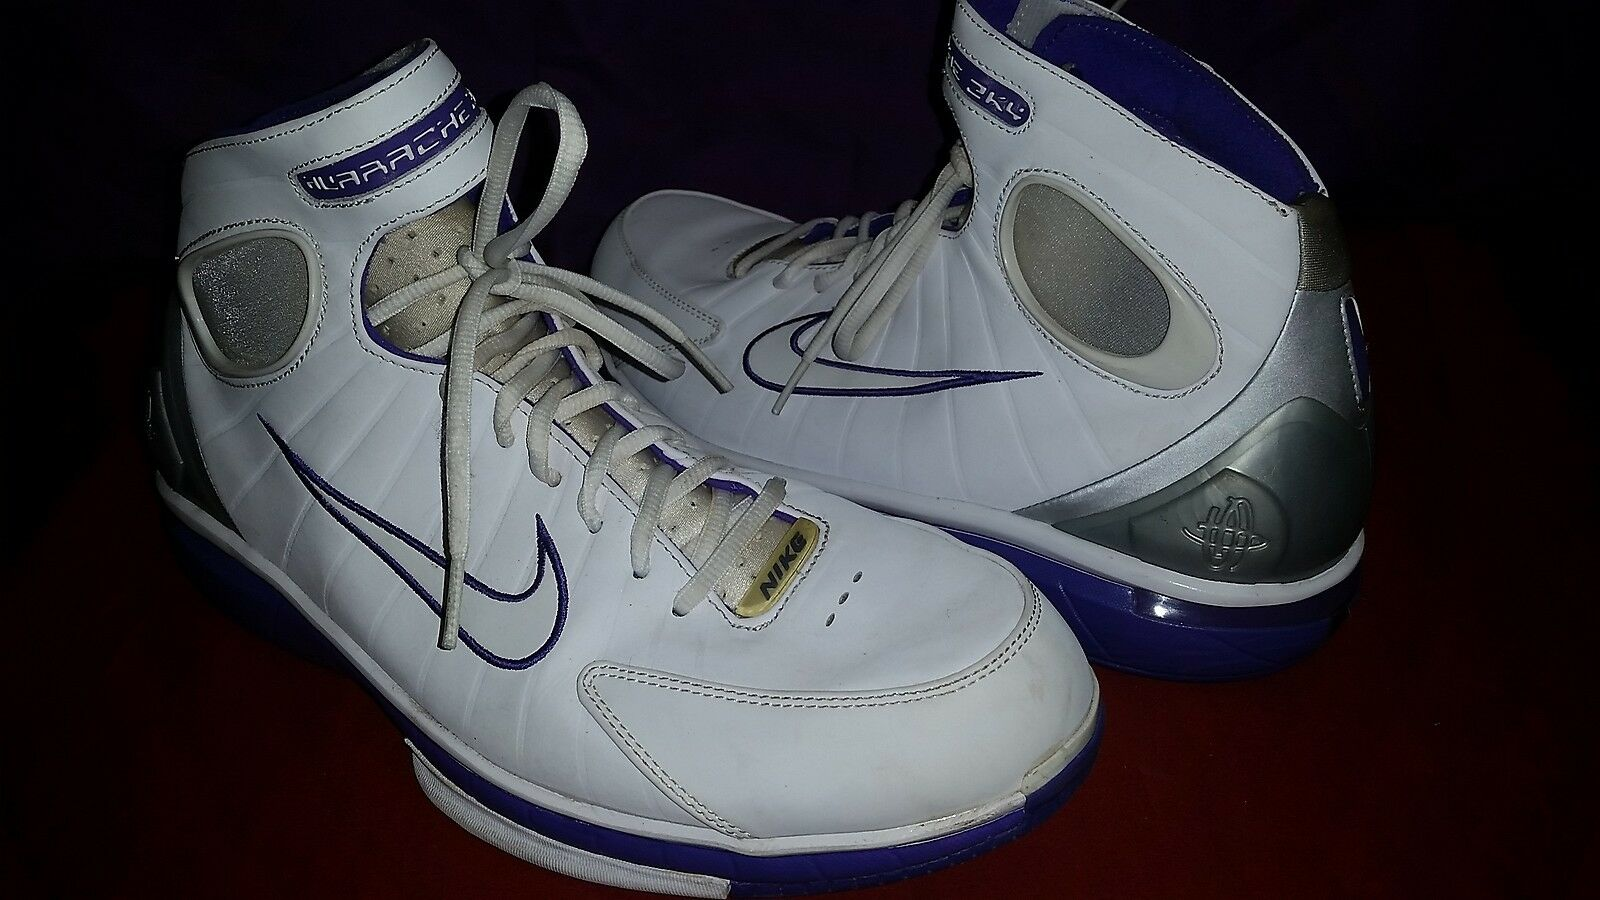 Nike Huarache Kobe Bryant White Met 2K4 Basketball 511525 Men's shoes size 12.5